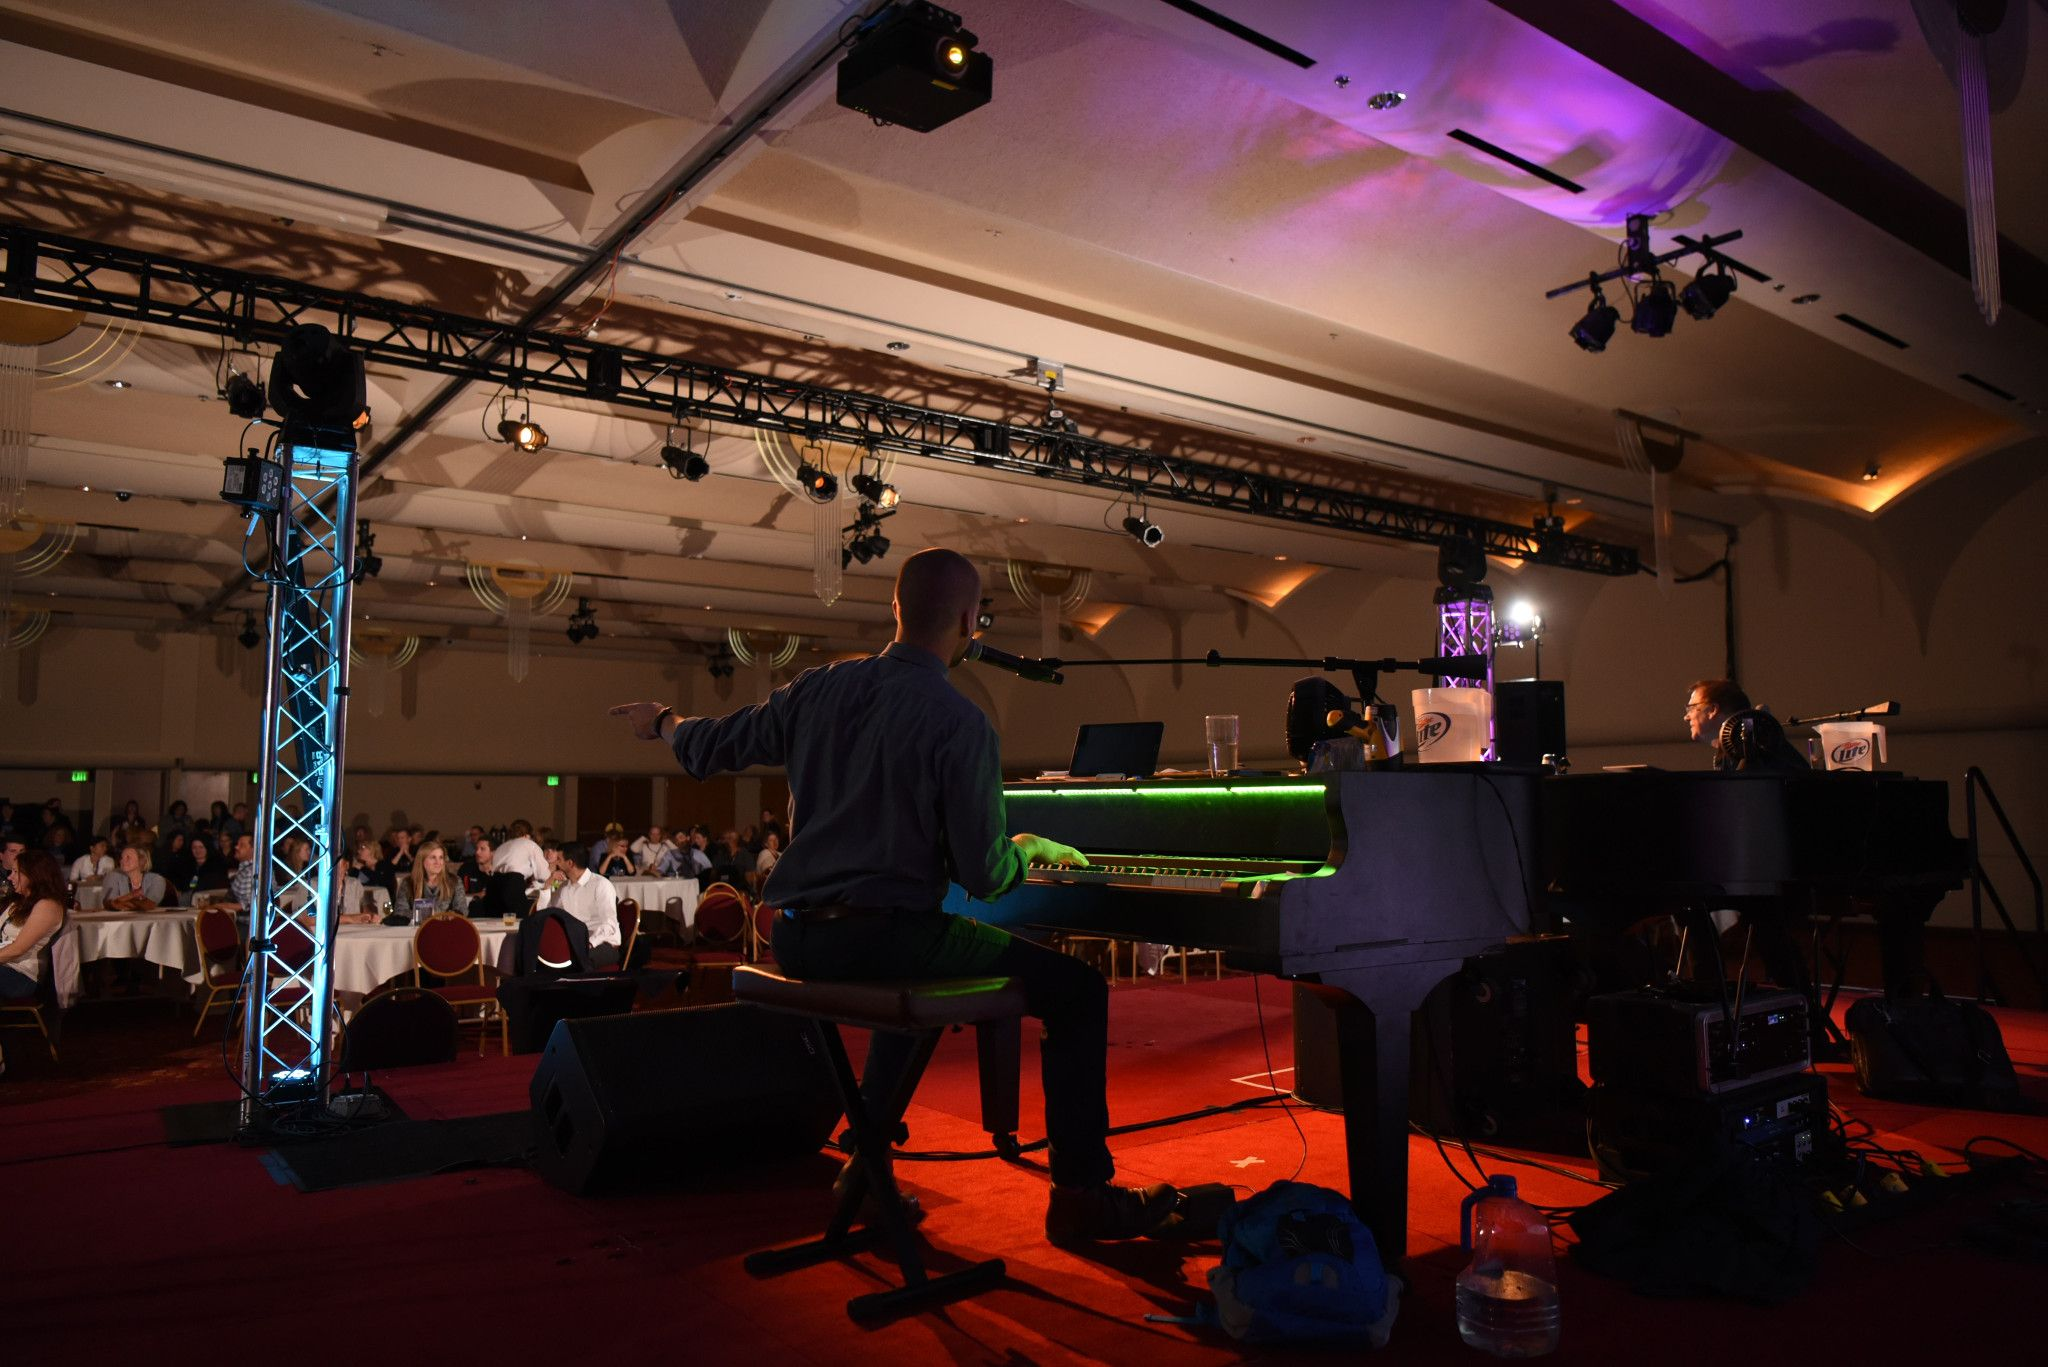 Widen Summit dueling pianos